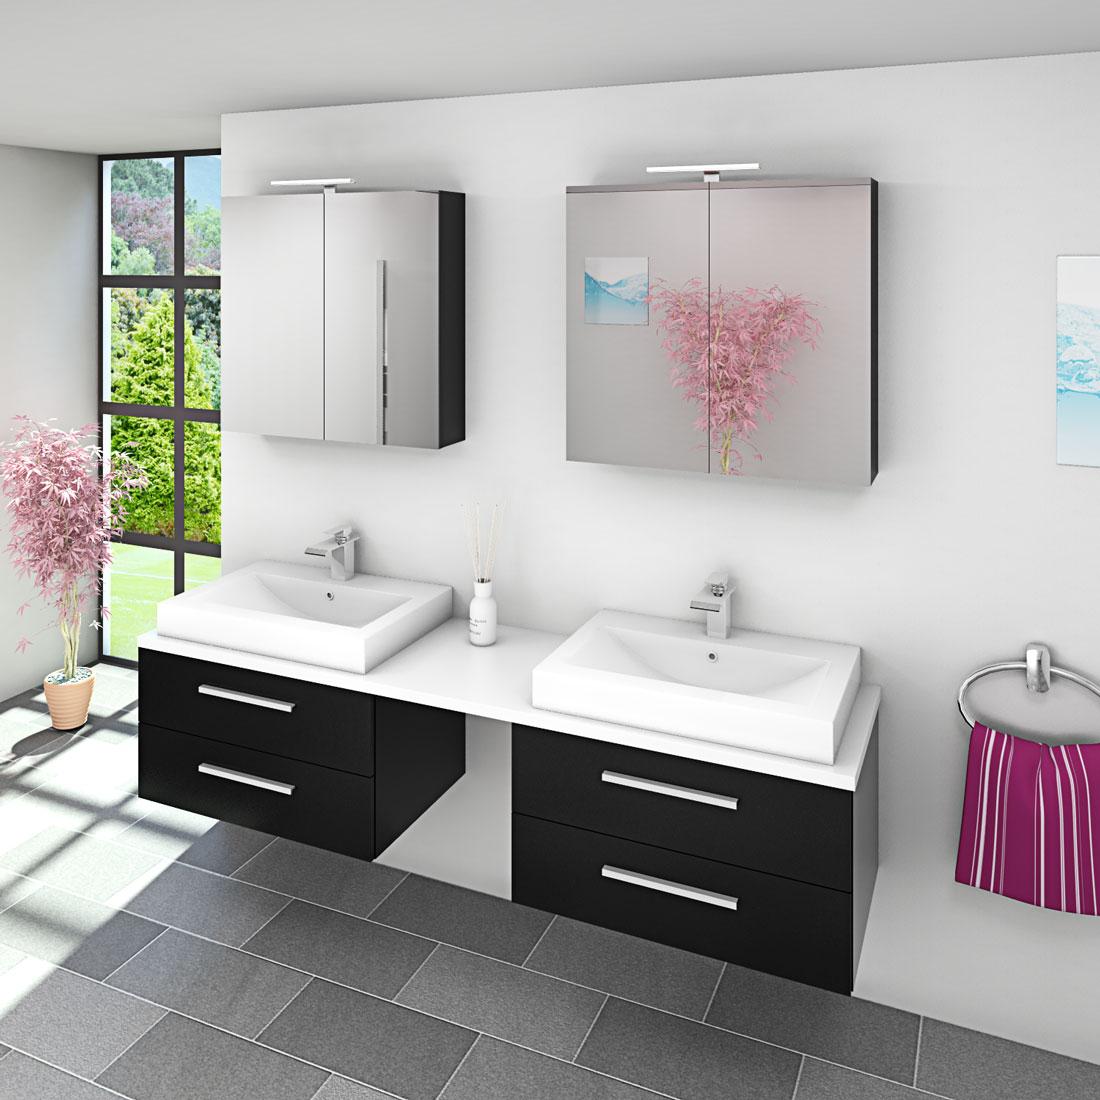 badm bel set city 207 v1 esche schwarz badezimmerm bel waschtisch 200cm. Black Bedroom Furniture Sets. Home Design Ideas